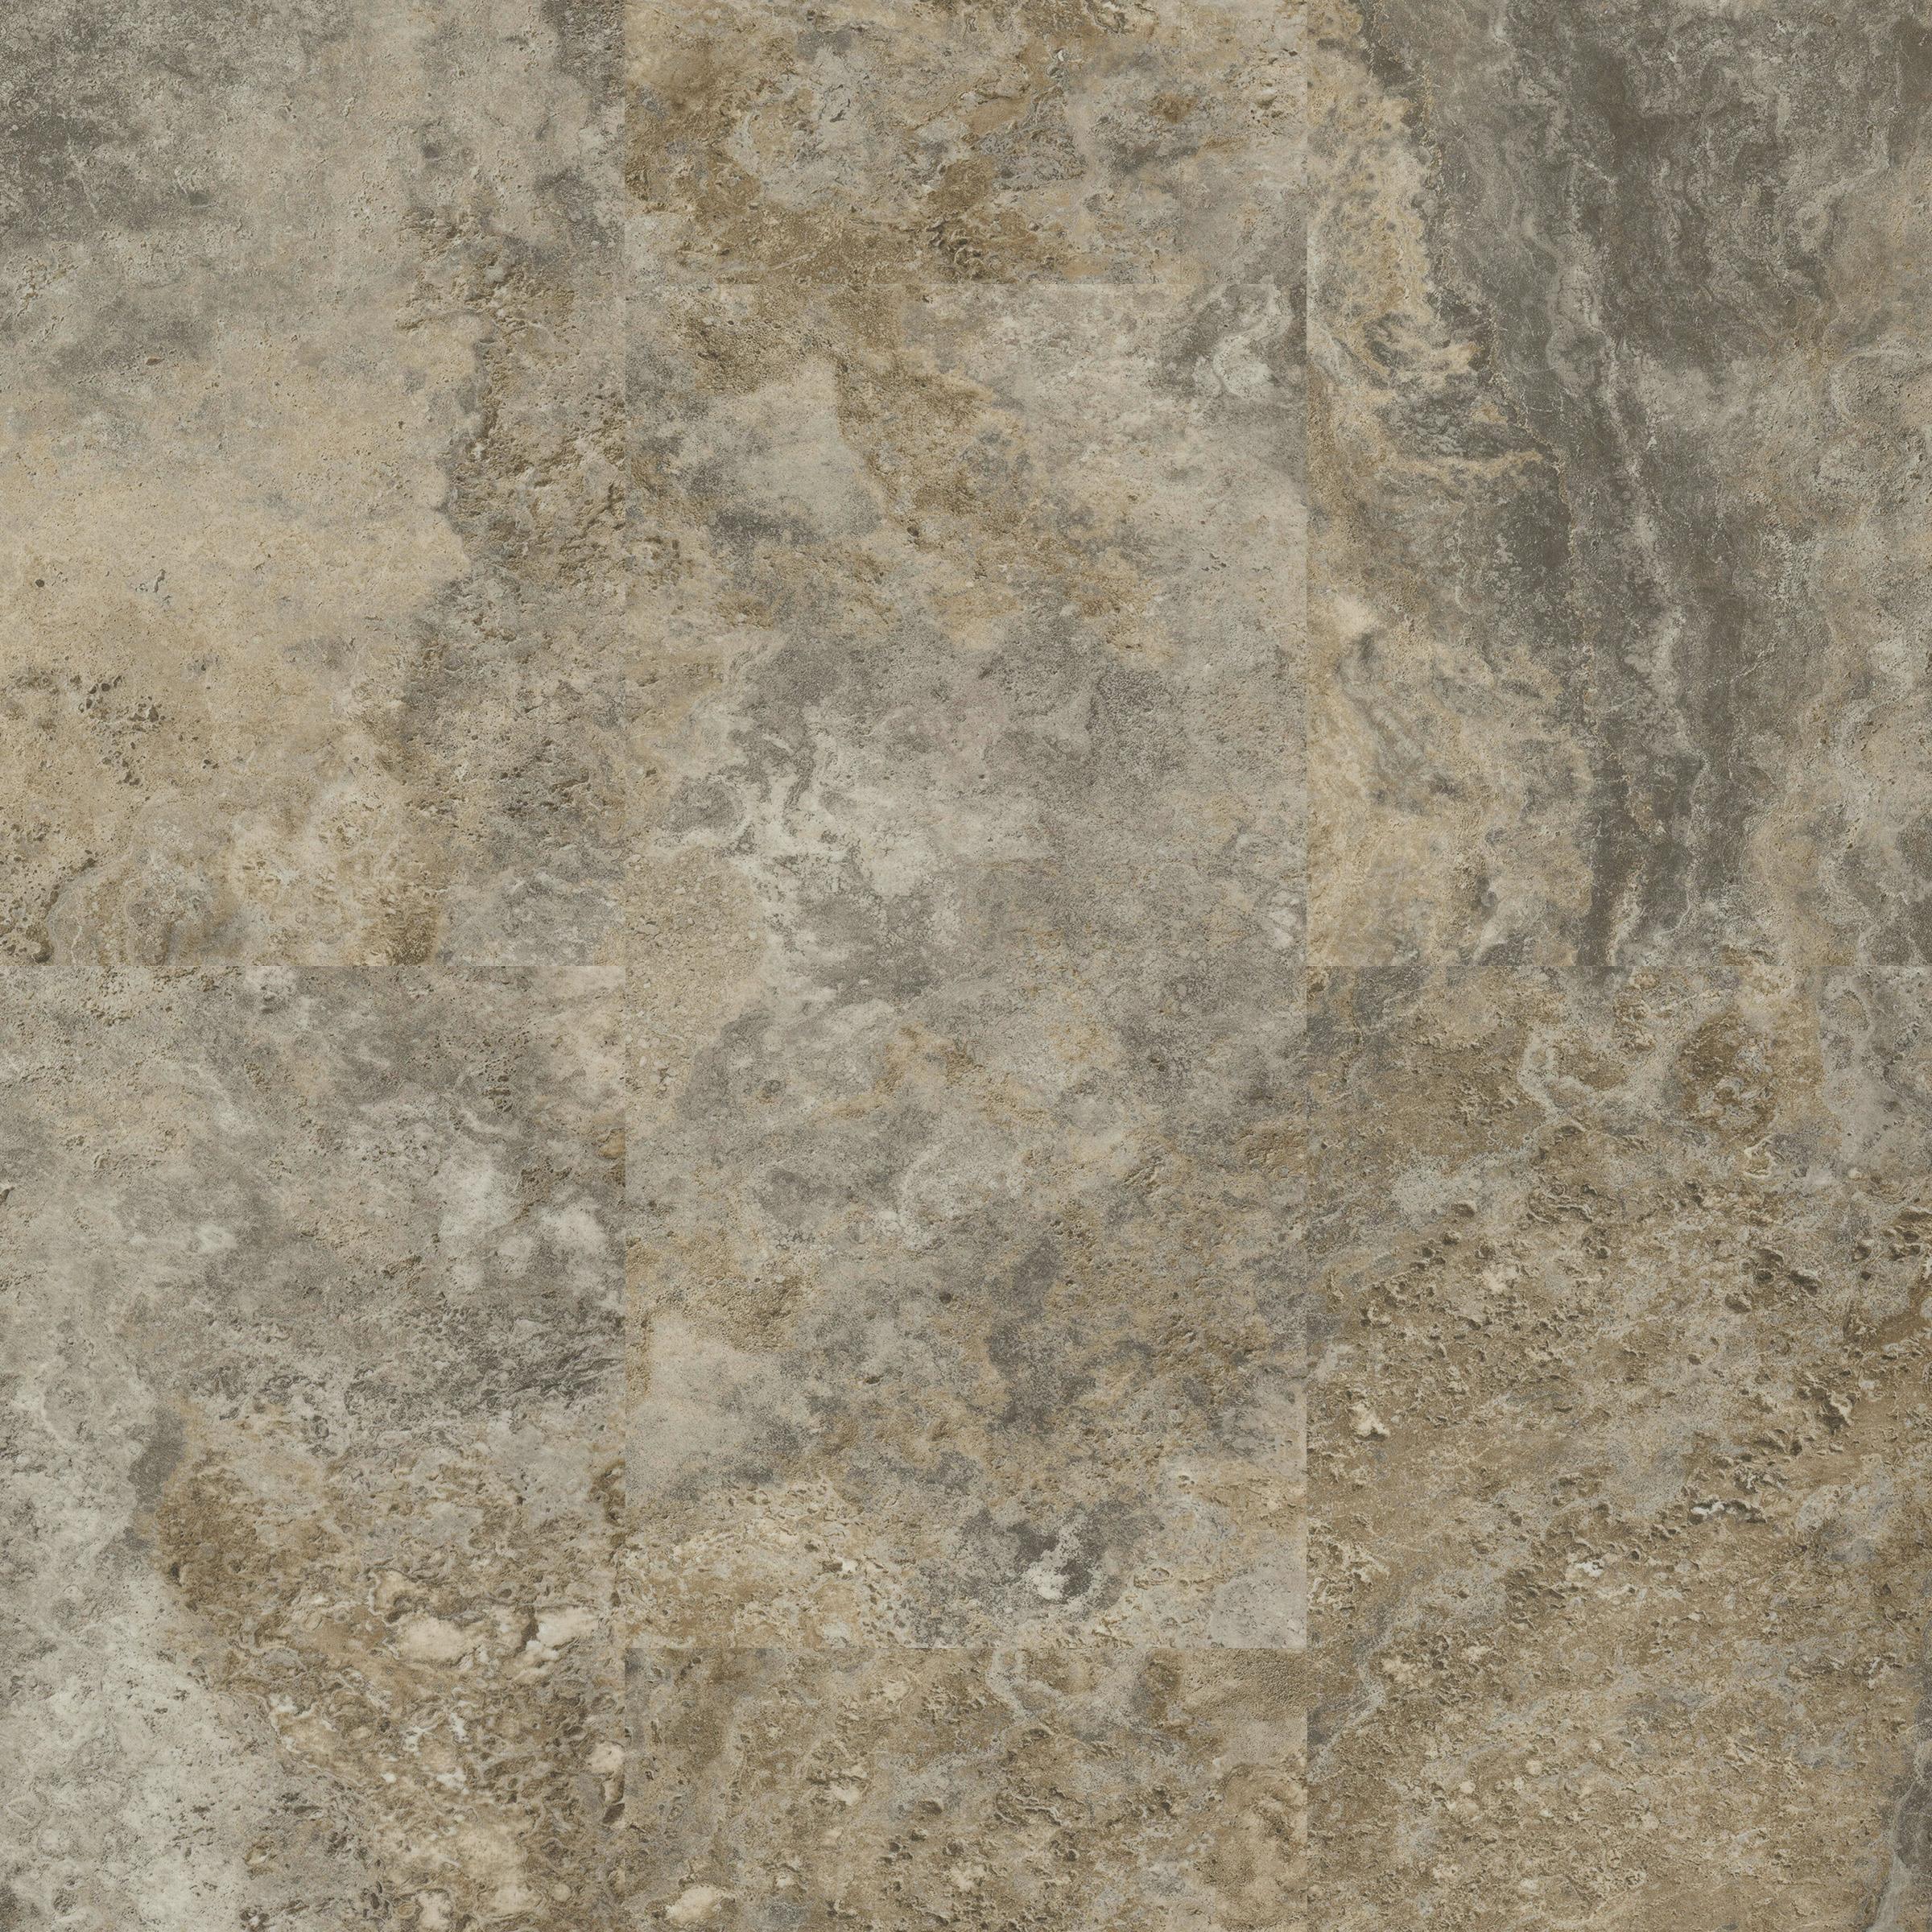 Moduleo Vision Arancione 12 X 24 Click Together Luxury Vinyl Tile Flooring 60076 Luxury Vinyl Tile Flooring Luxury Vinyl Tile Flooring